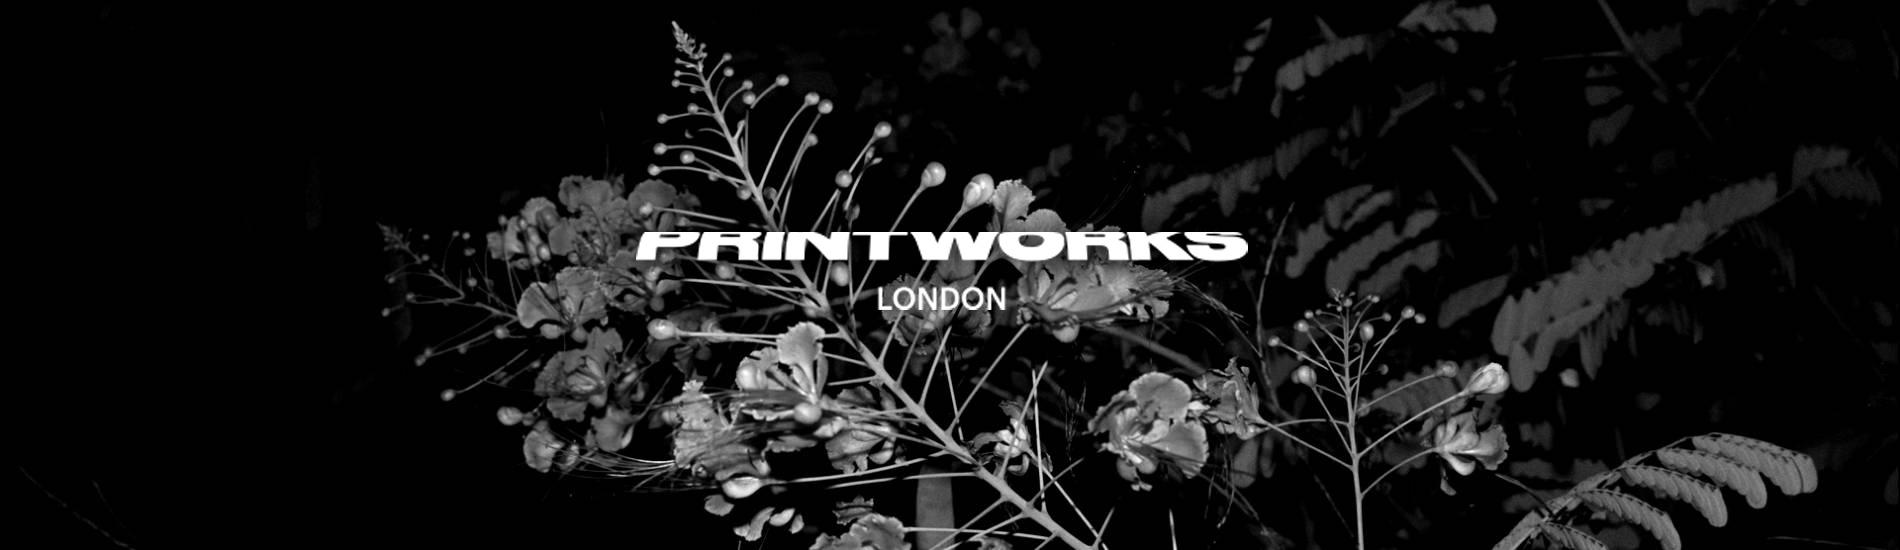 Printworks Spring 2019 Season Announced